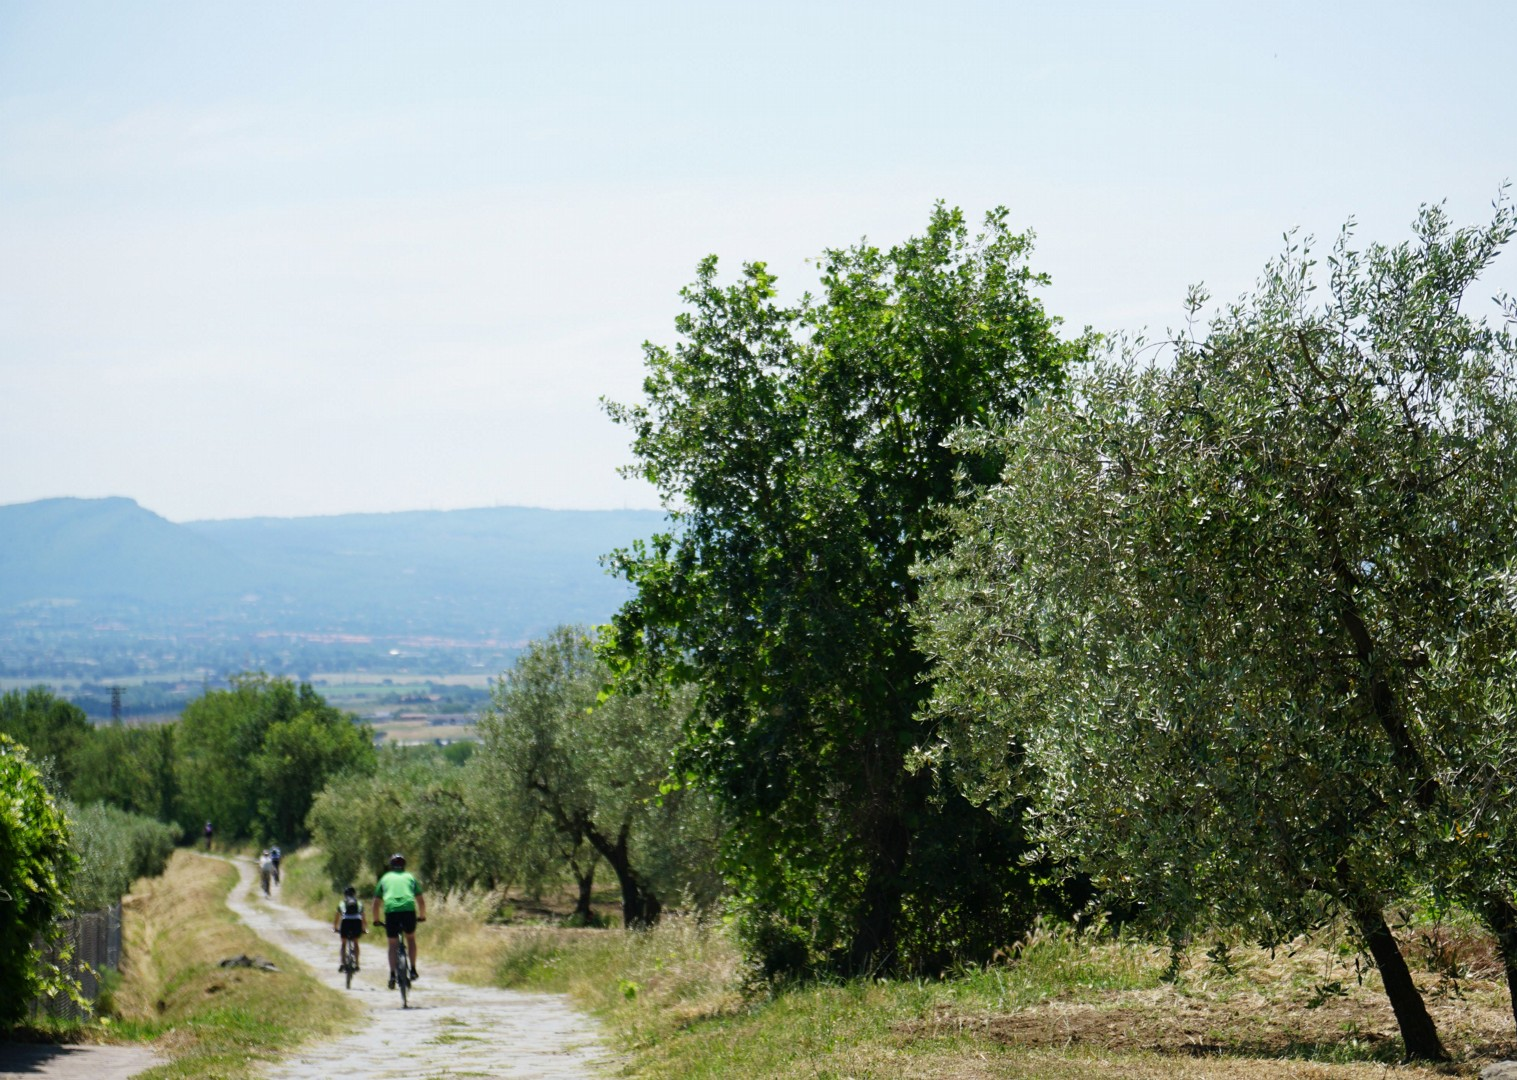 35875669755_20e8ea84fa_o.jpg - Italy - Via Francigena (Tuscany to Rome) - Mountain Biking